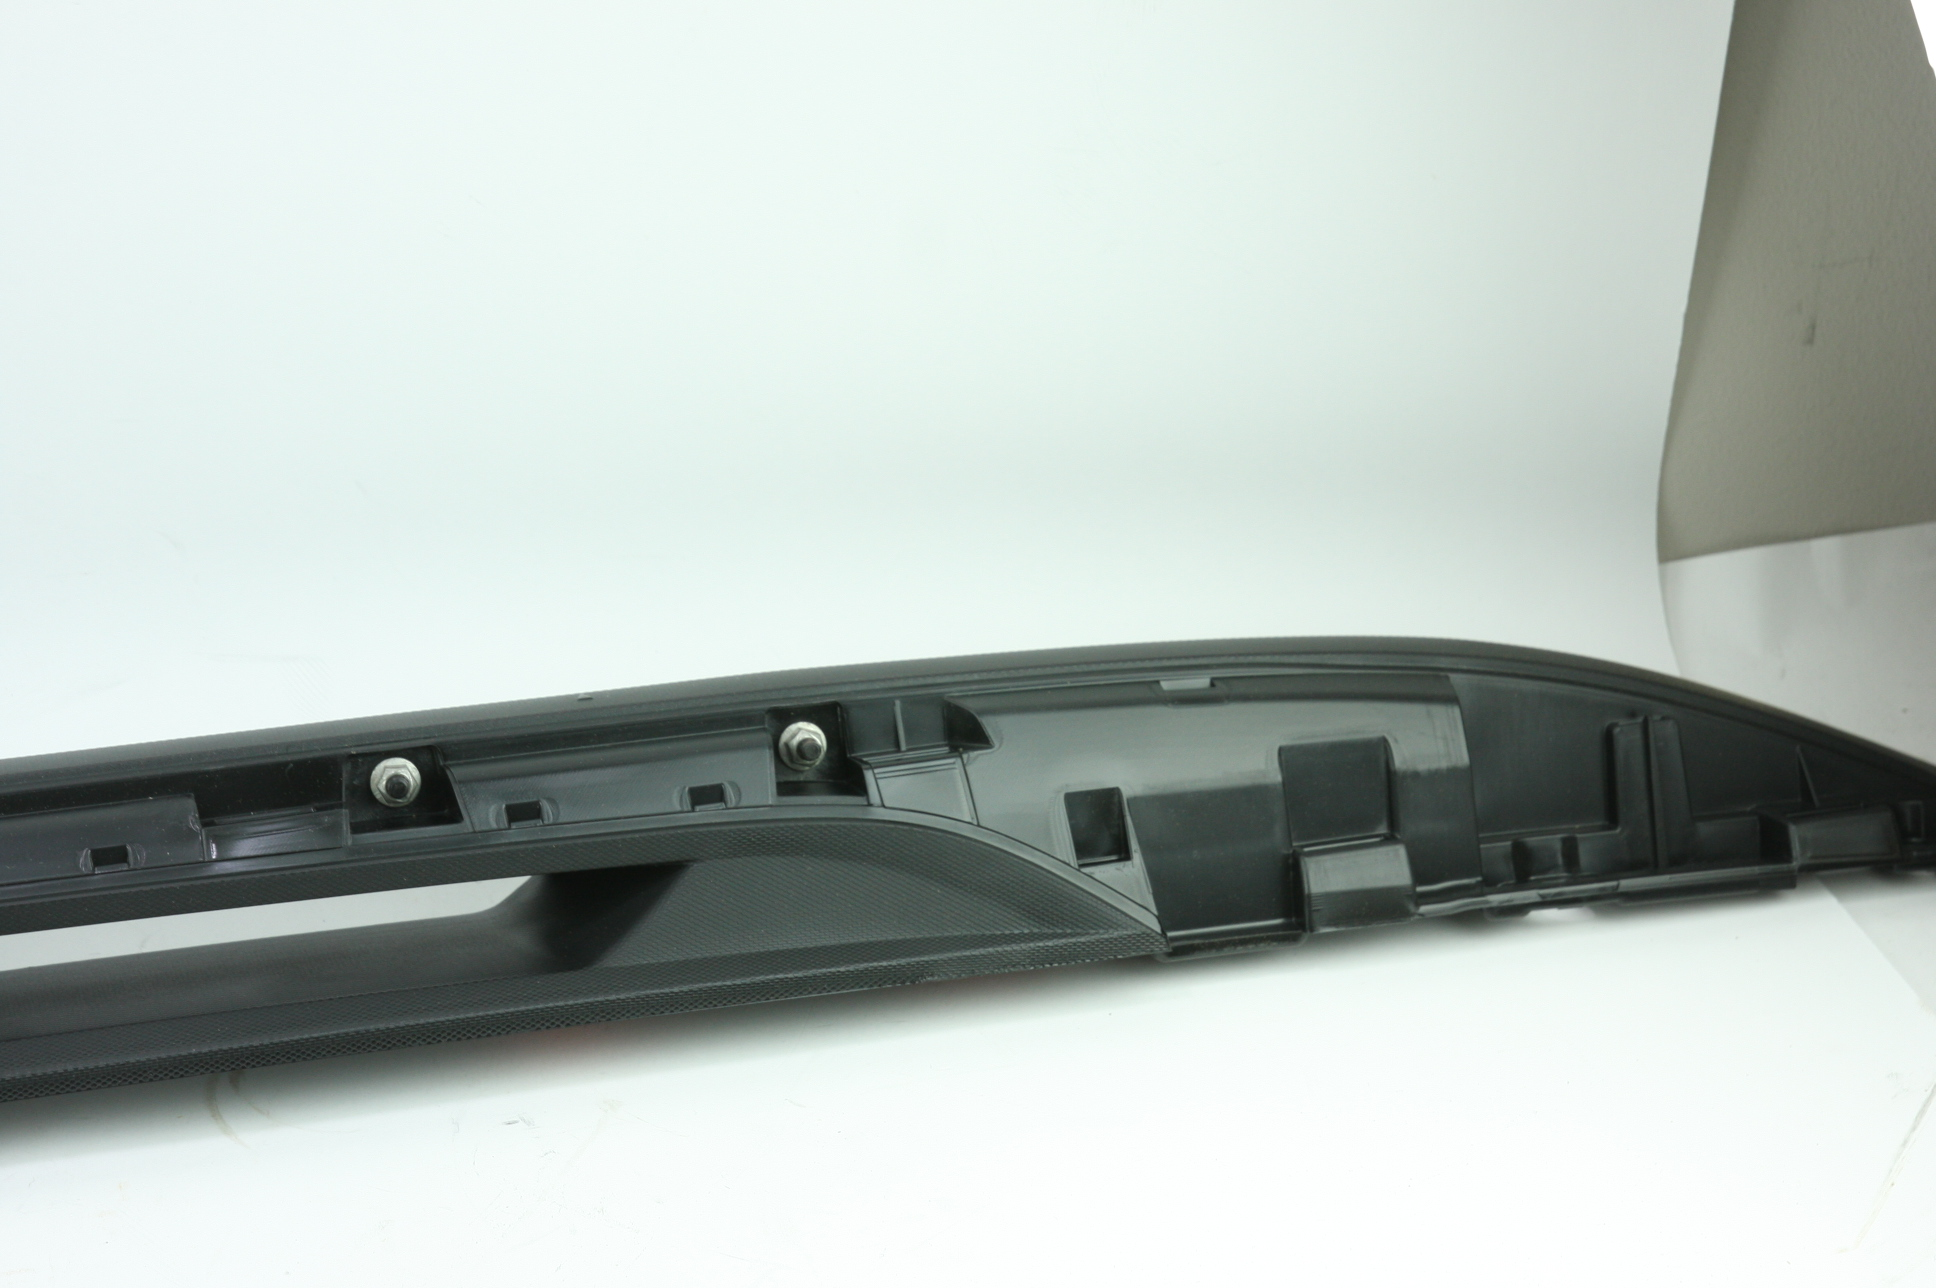 *** New Genuine OEM 23324213 GM Roof Rack Luggage Carrier Side Rail LH 84016250 - image 6